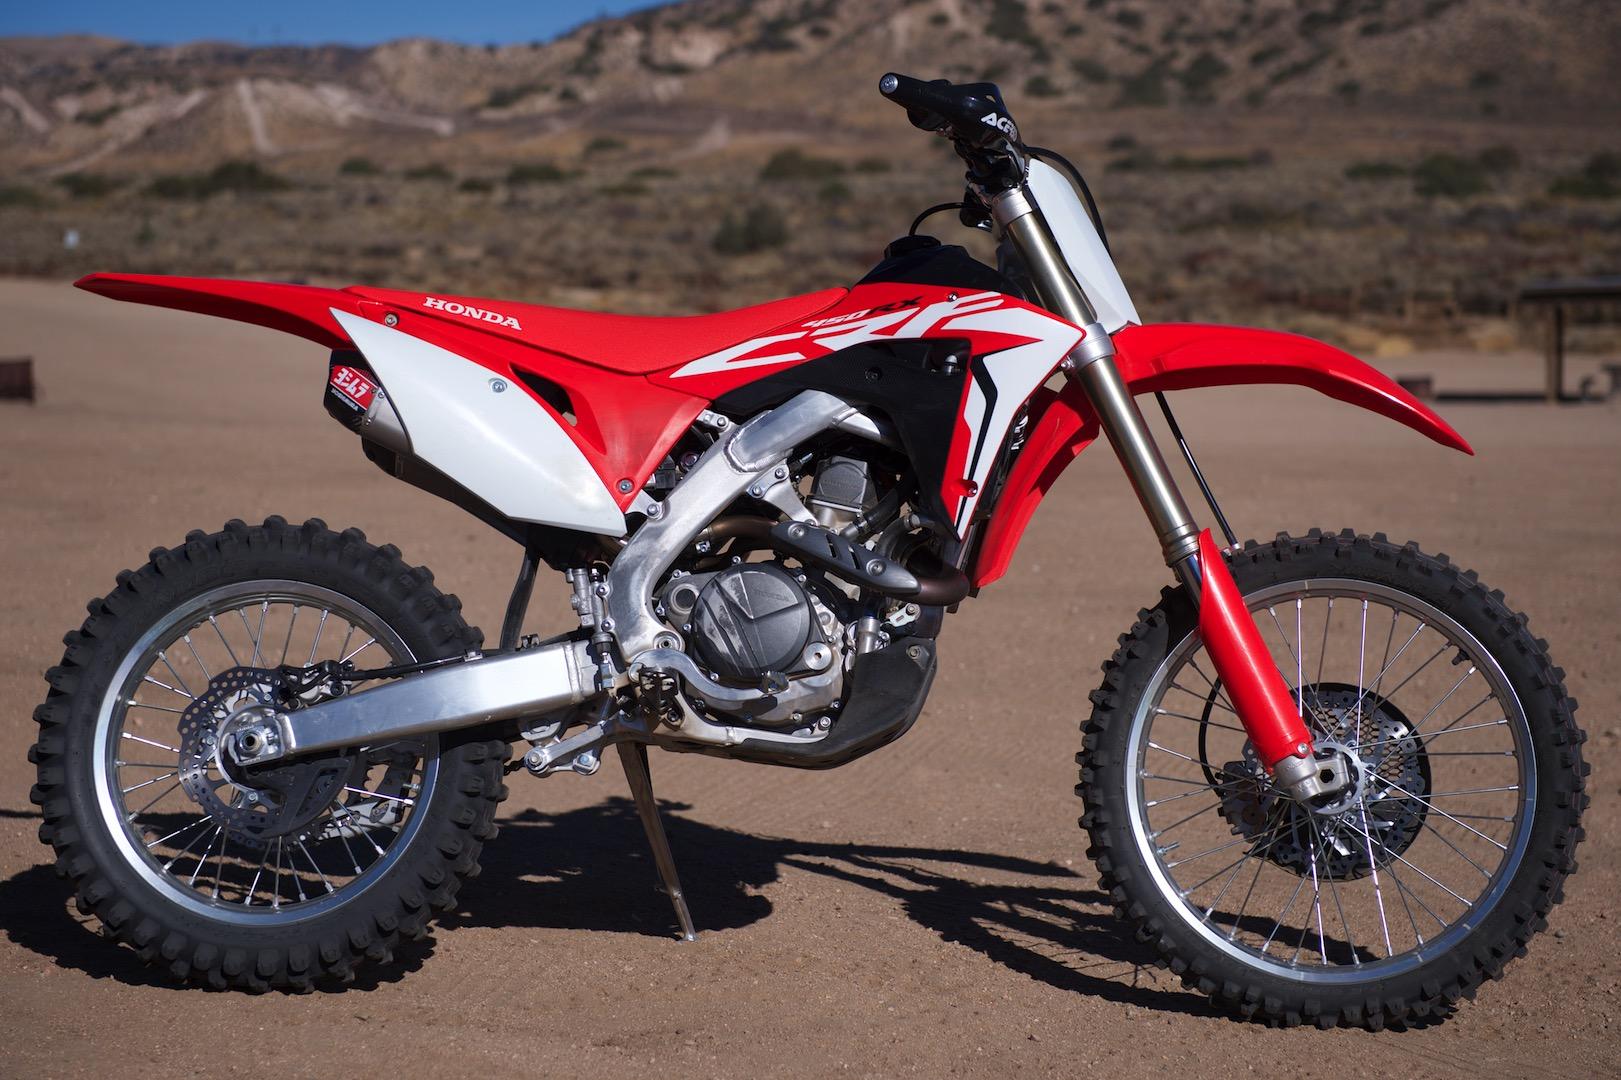 2018 Honda CRF450RX Project Bike test